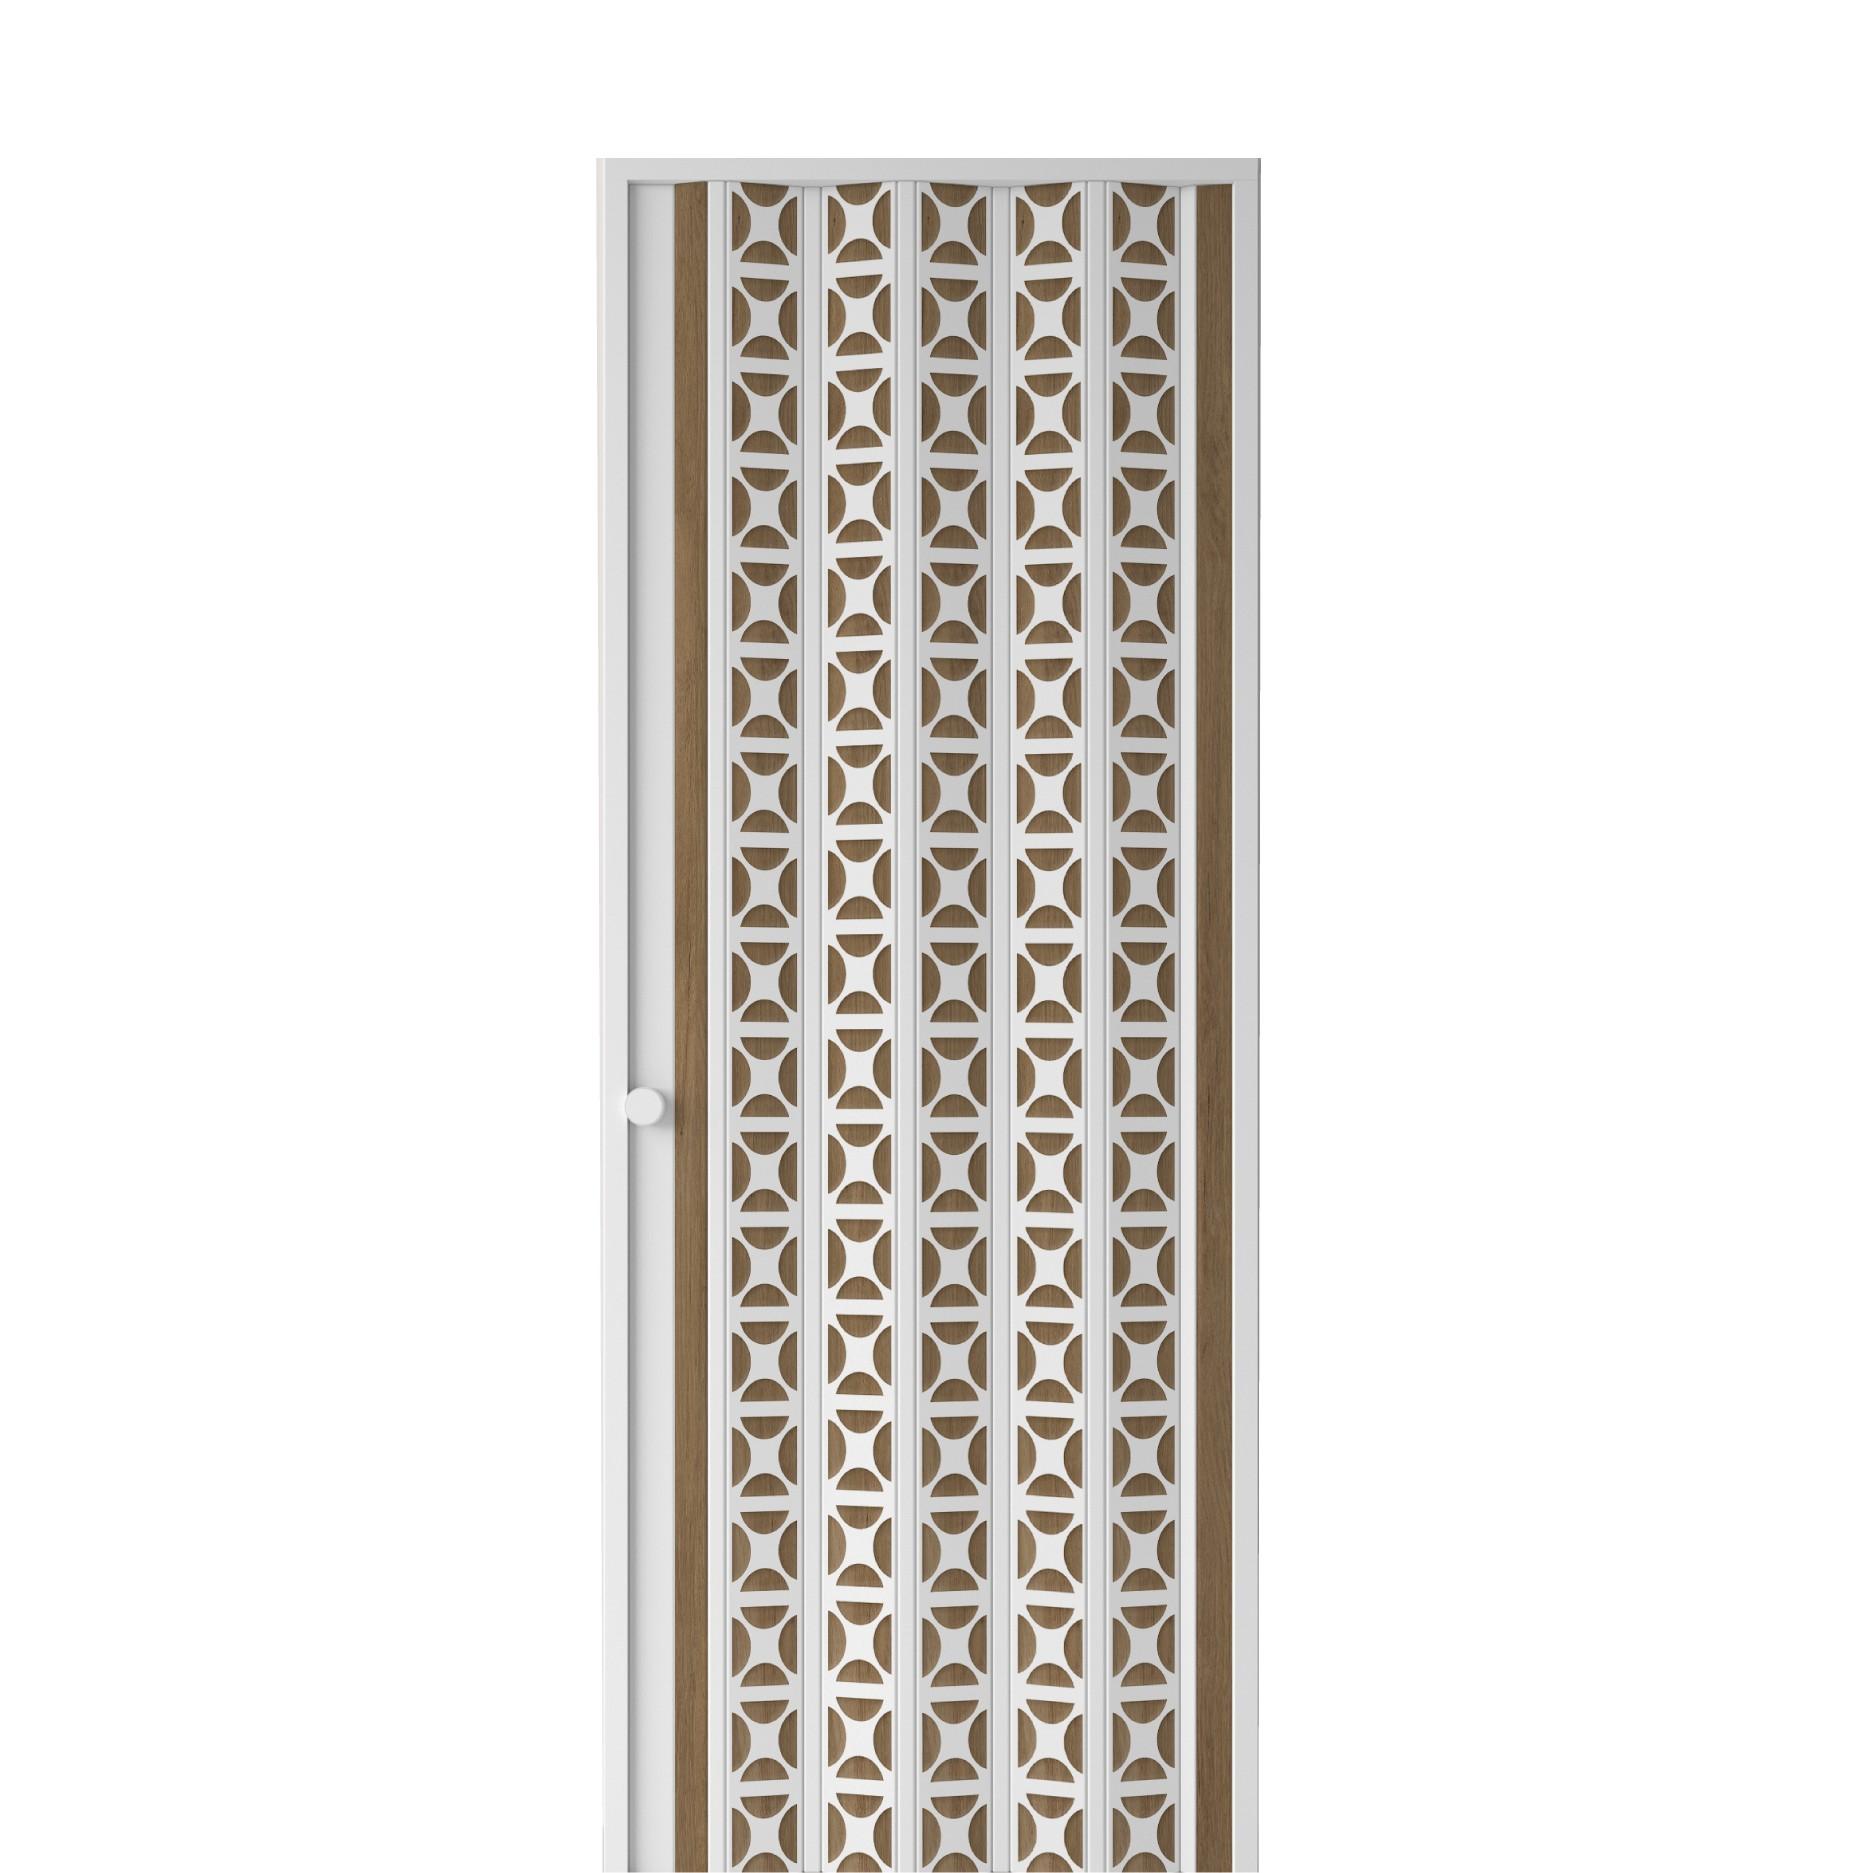 Porta Sanfonada de PVC 70x210 cm Marrom Claro - Araforros